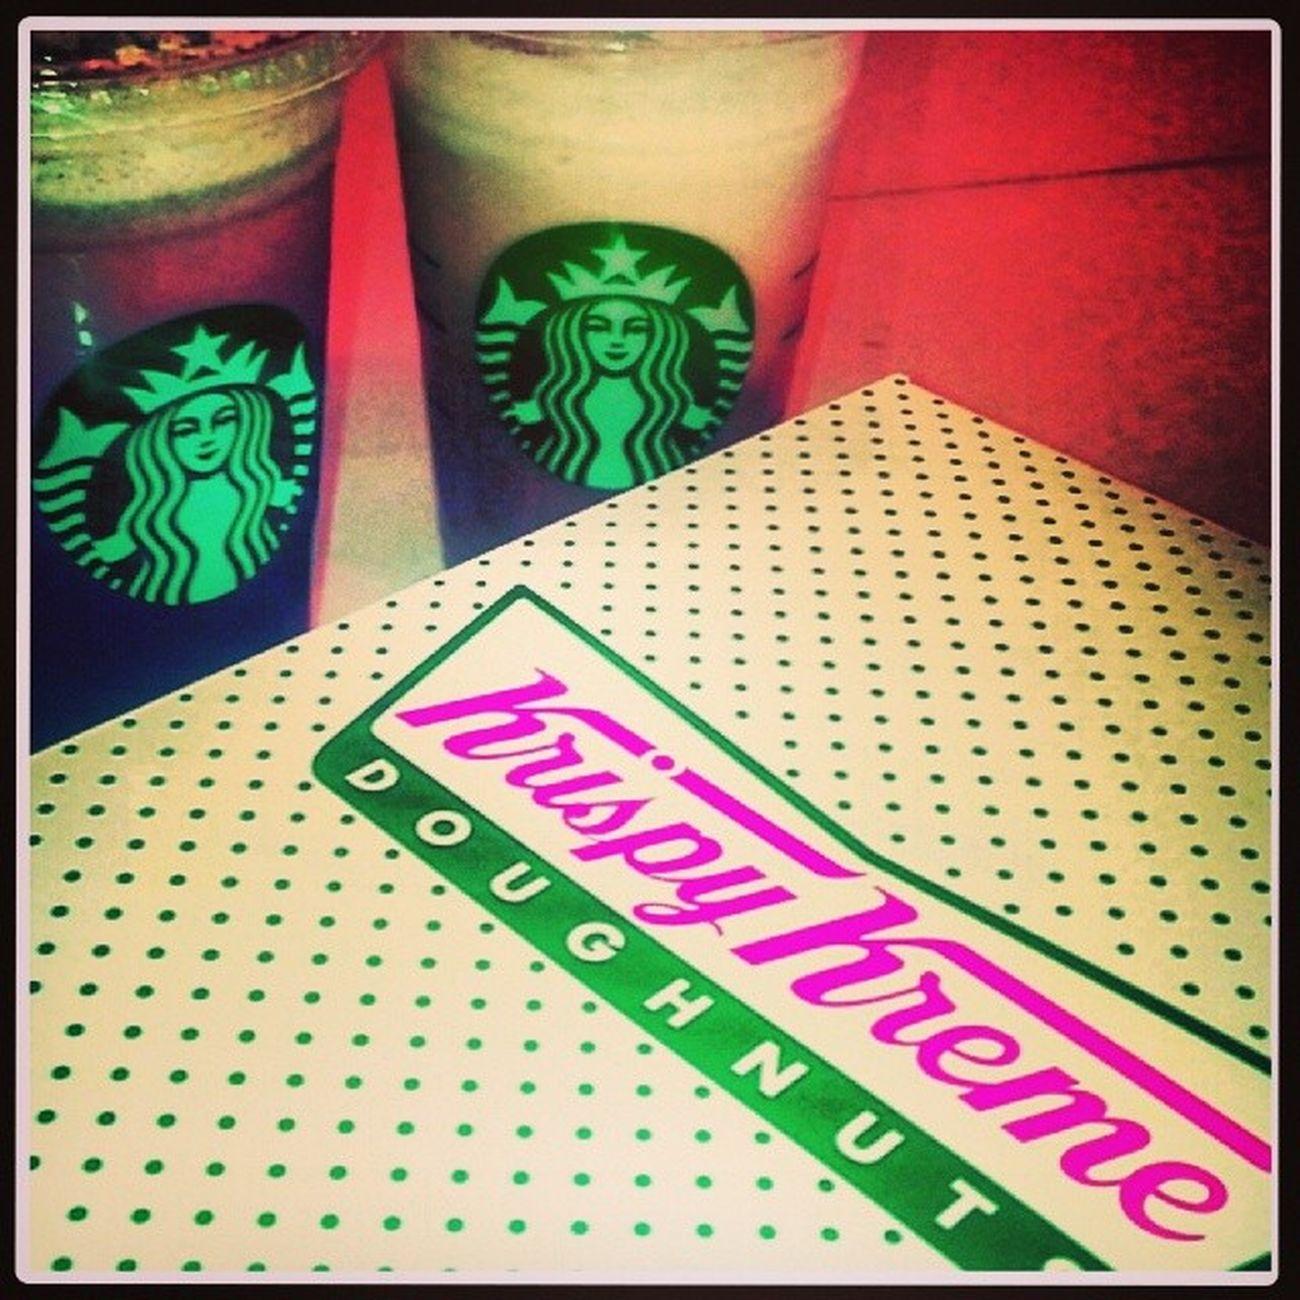 Krispy Kreme Starbucks Gian Samuel Me Joven Gala Photoshoot MOA PasayCity NewportCity Enjoy Smiling Kagutom